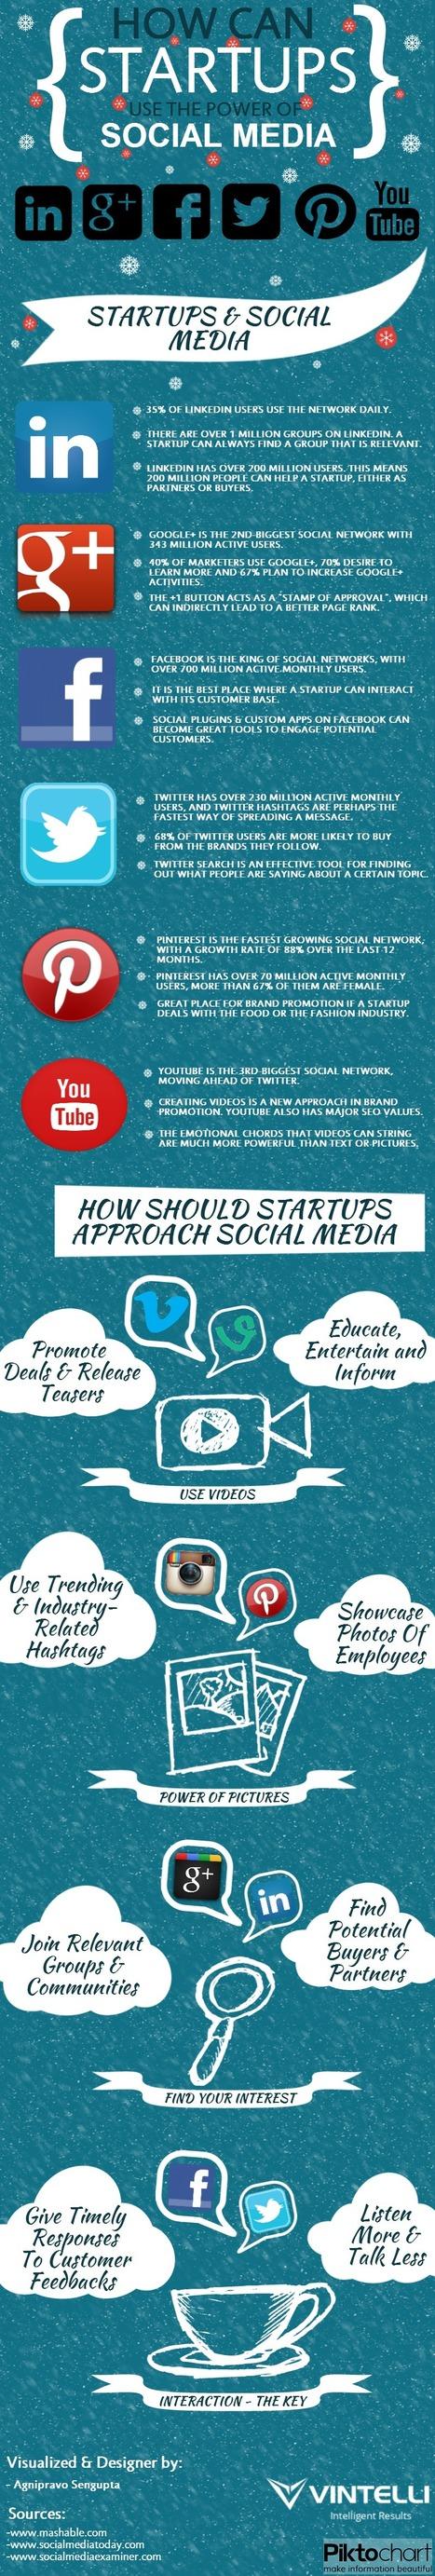 Social Media, uno strumento per le Startup   Blog ICC   Social Media e Nuove Tendenze Digitali   Scoop.it